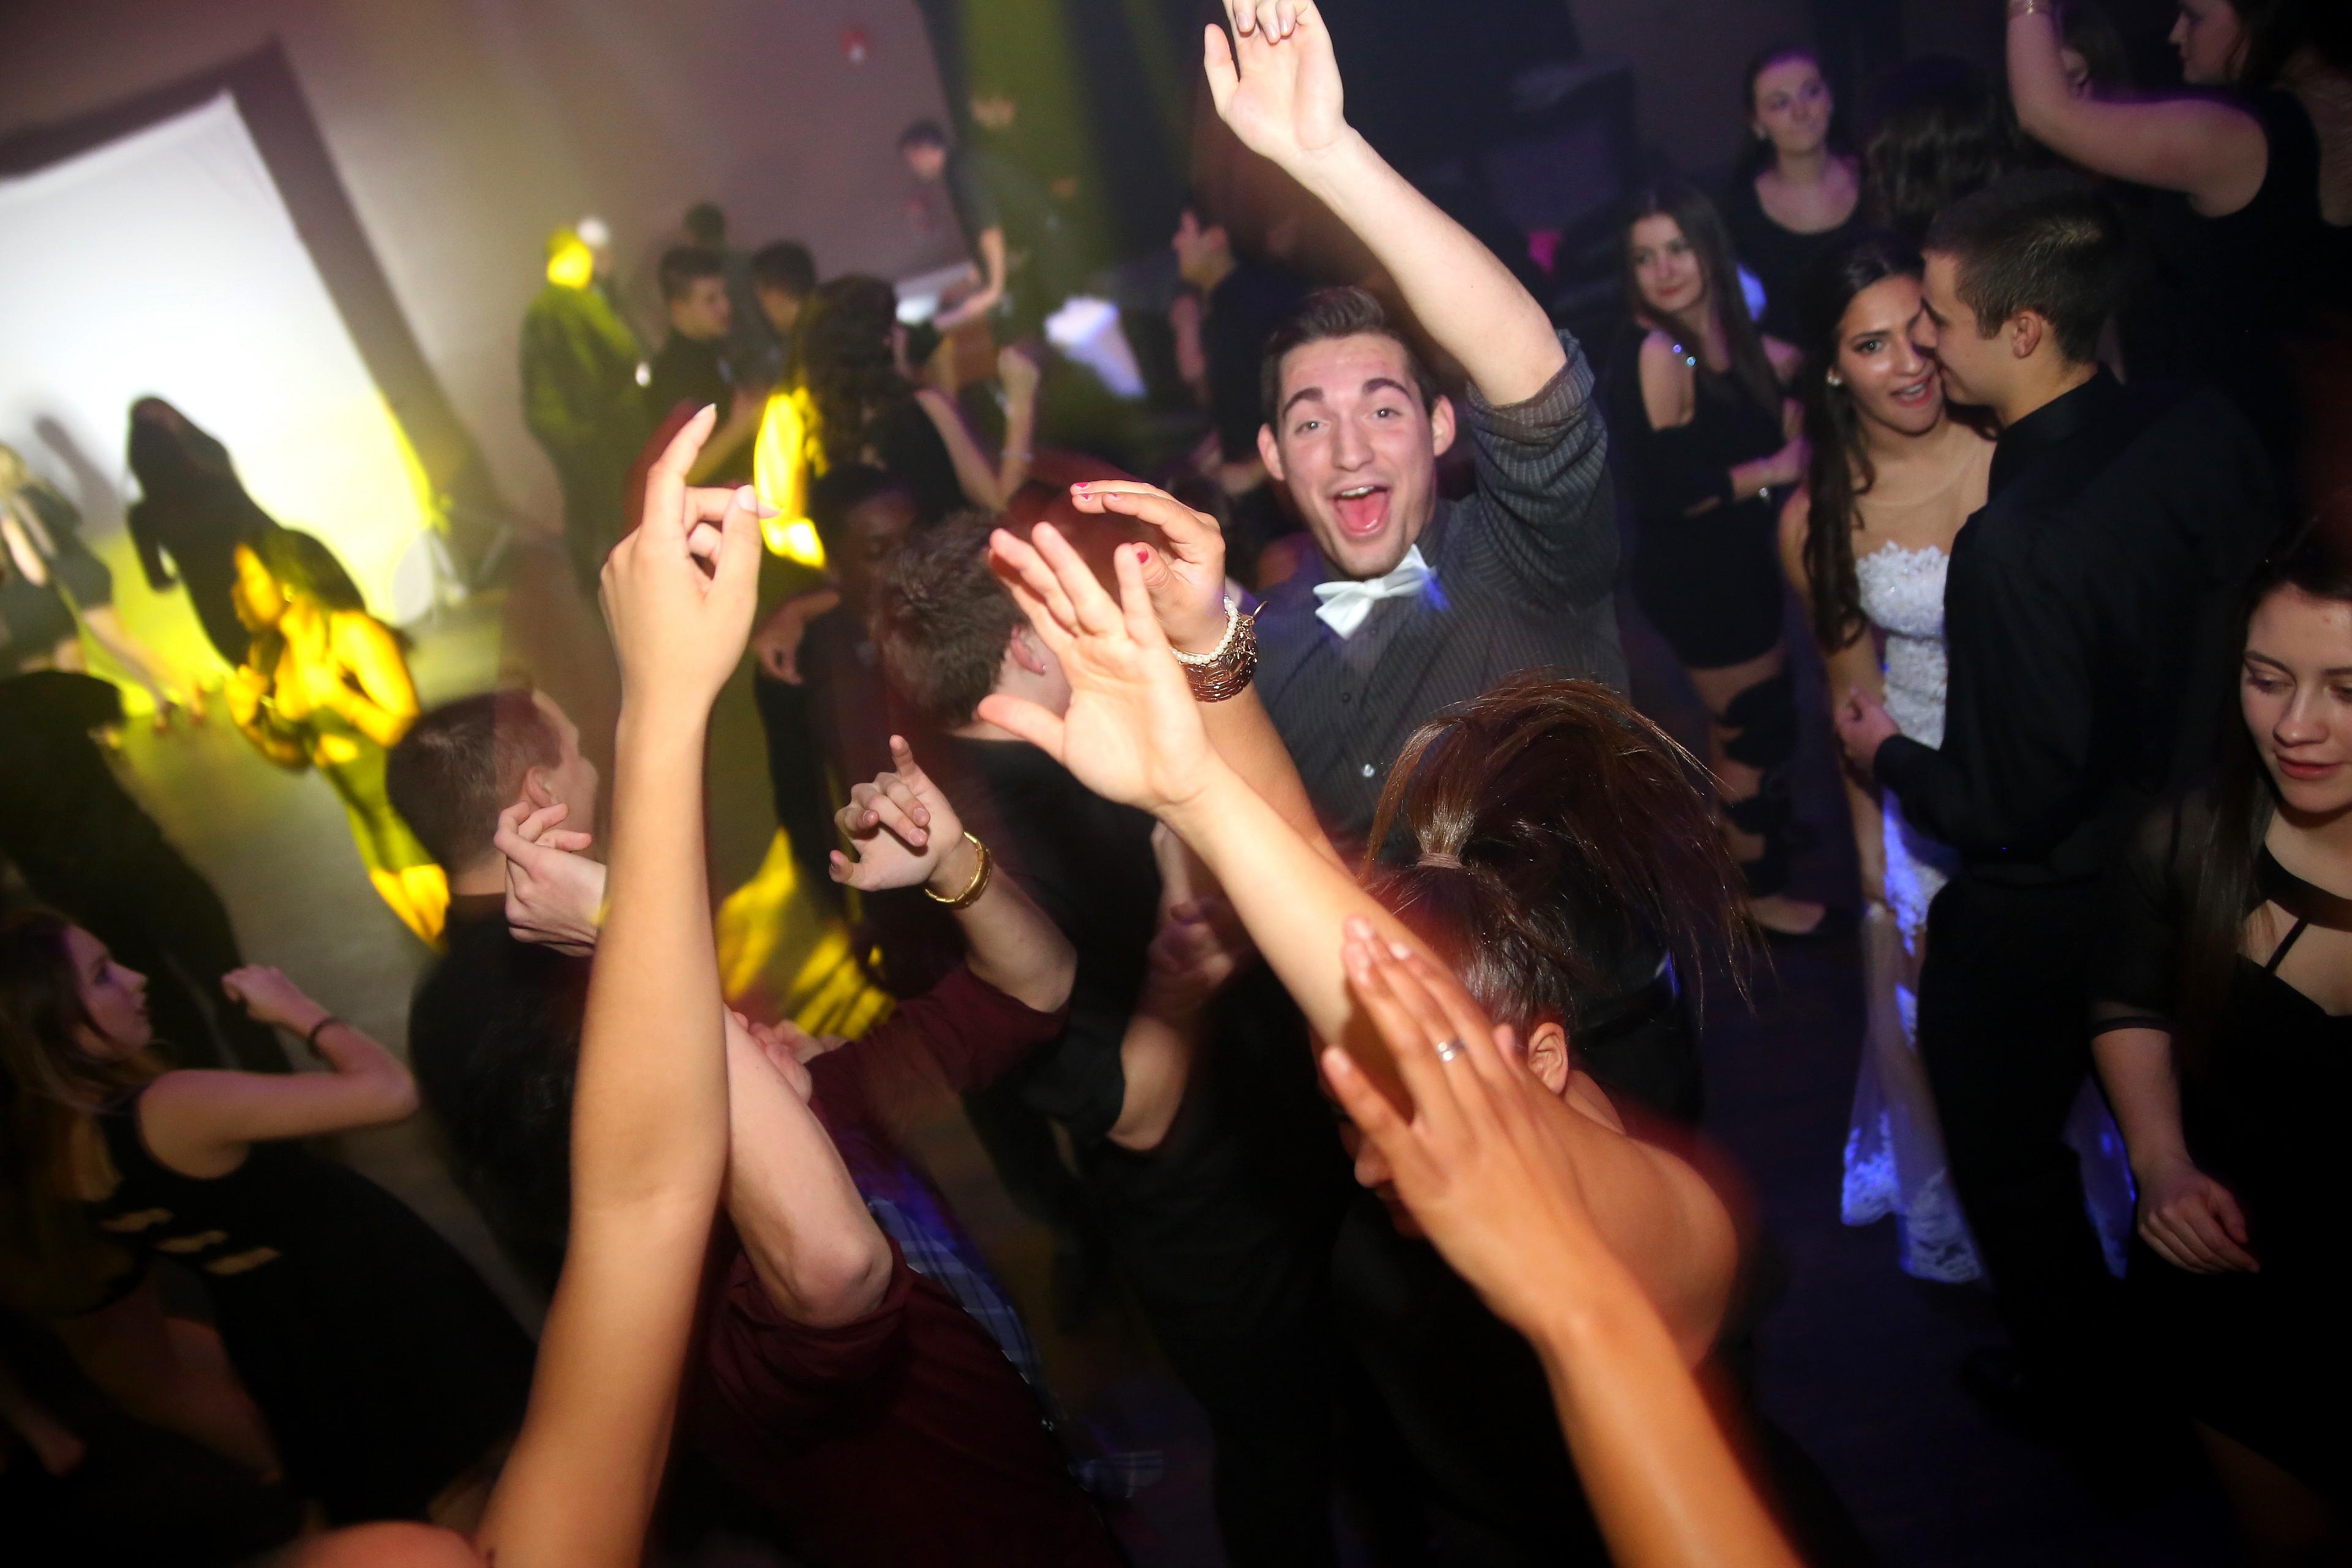 Dance Floor Sweet 16 VIBE